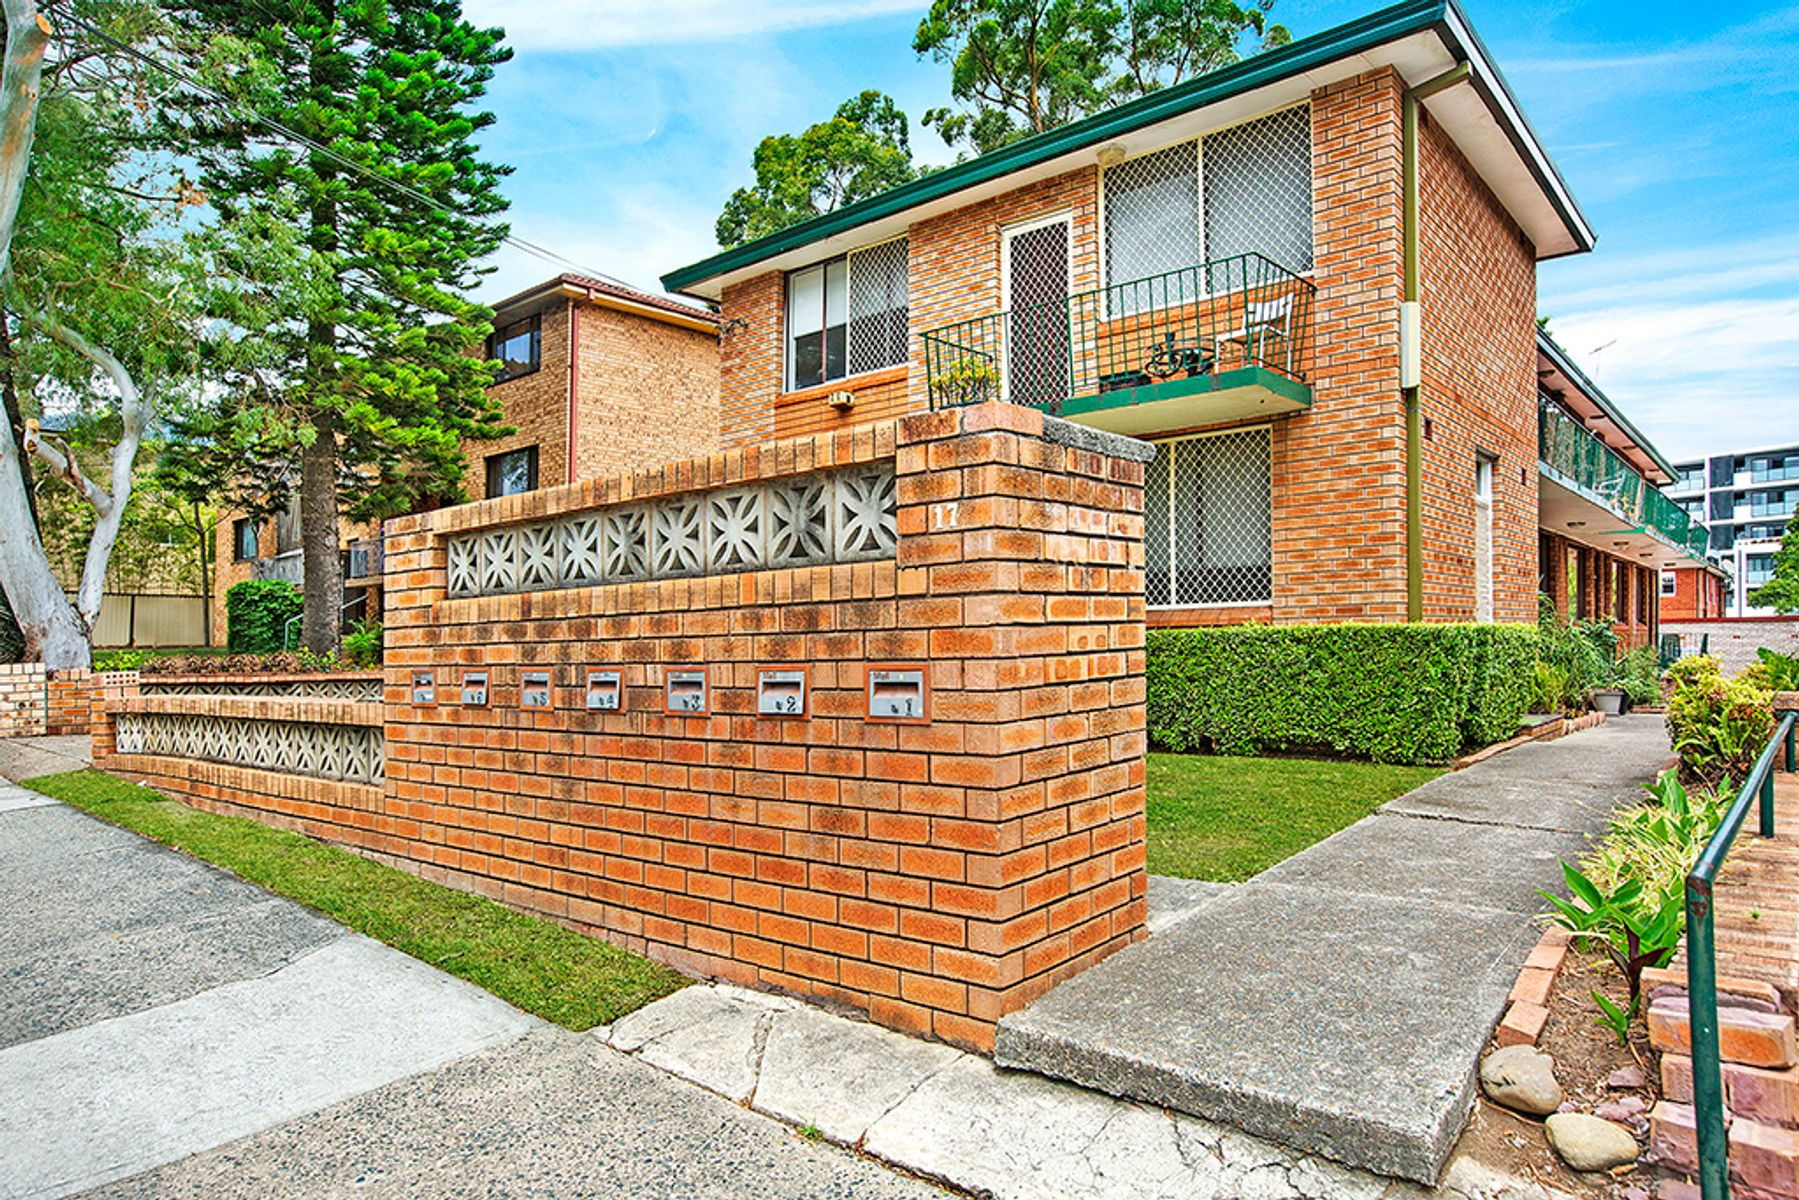 6/17 Drummond Street, Belmore, NSW 2192